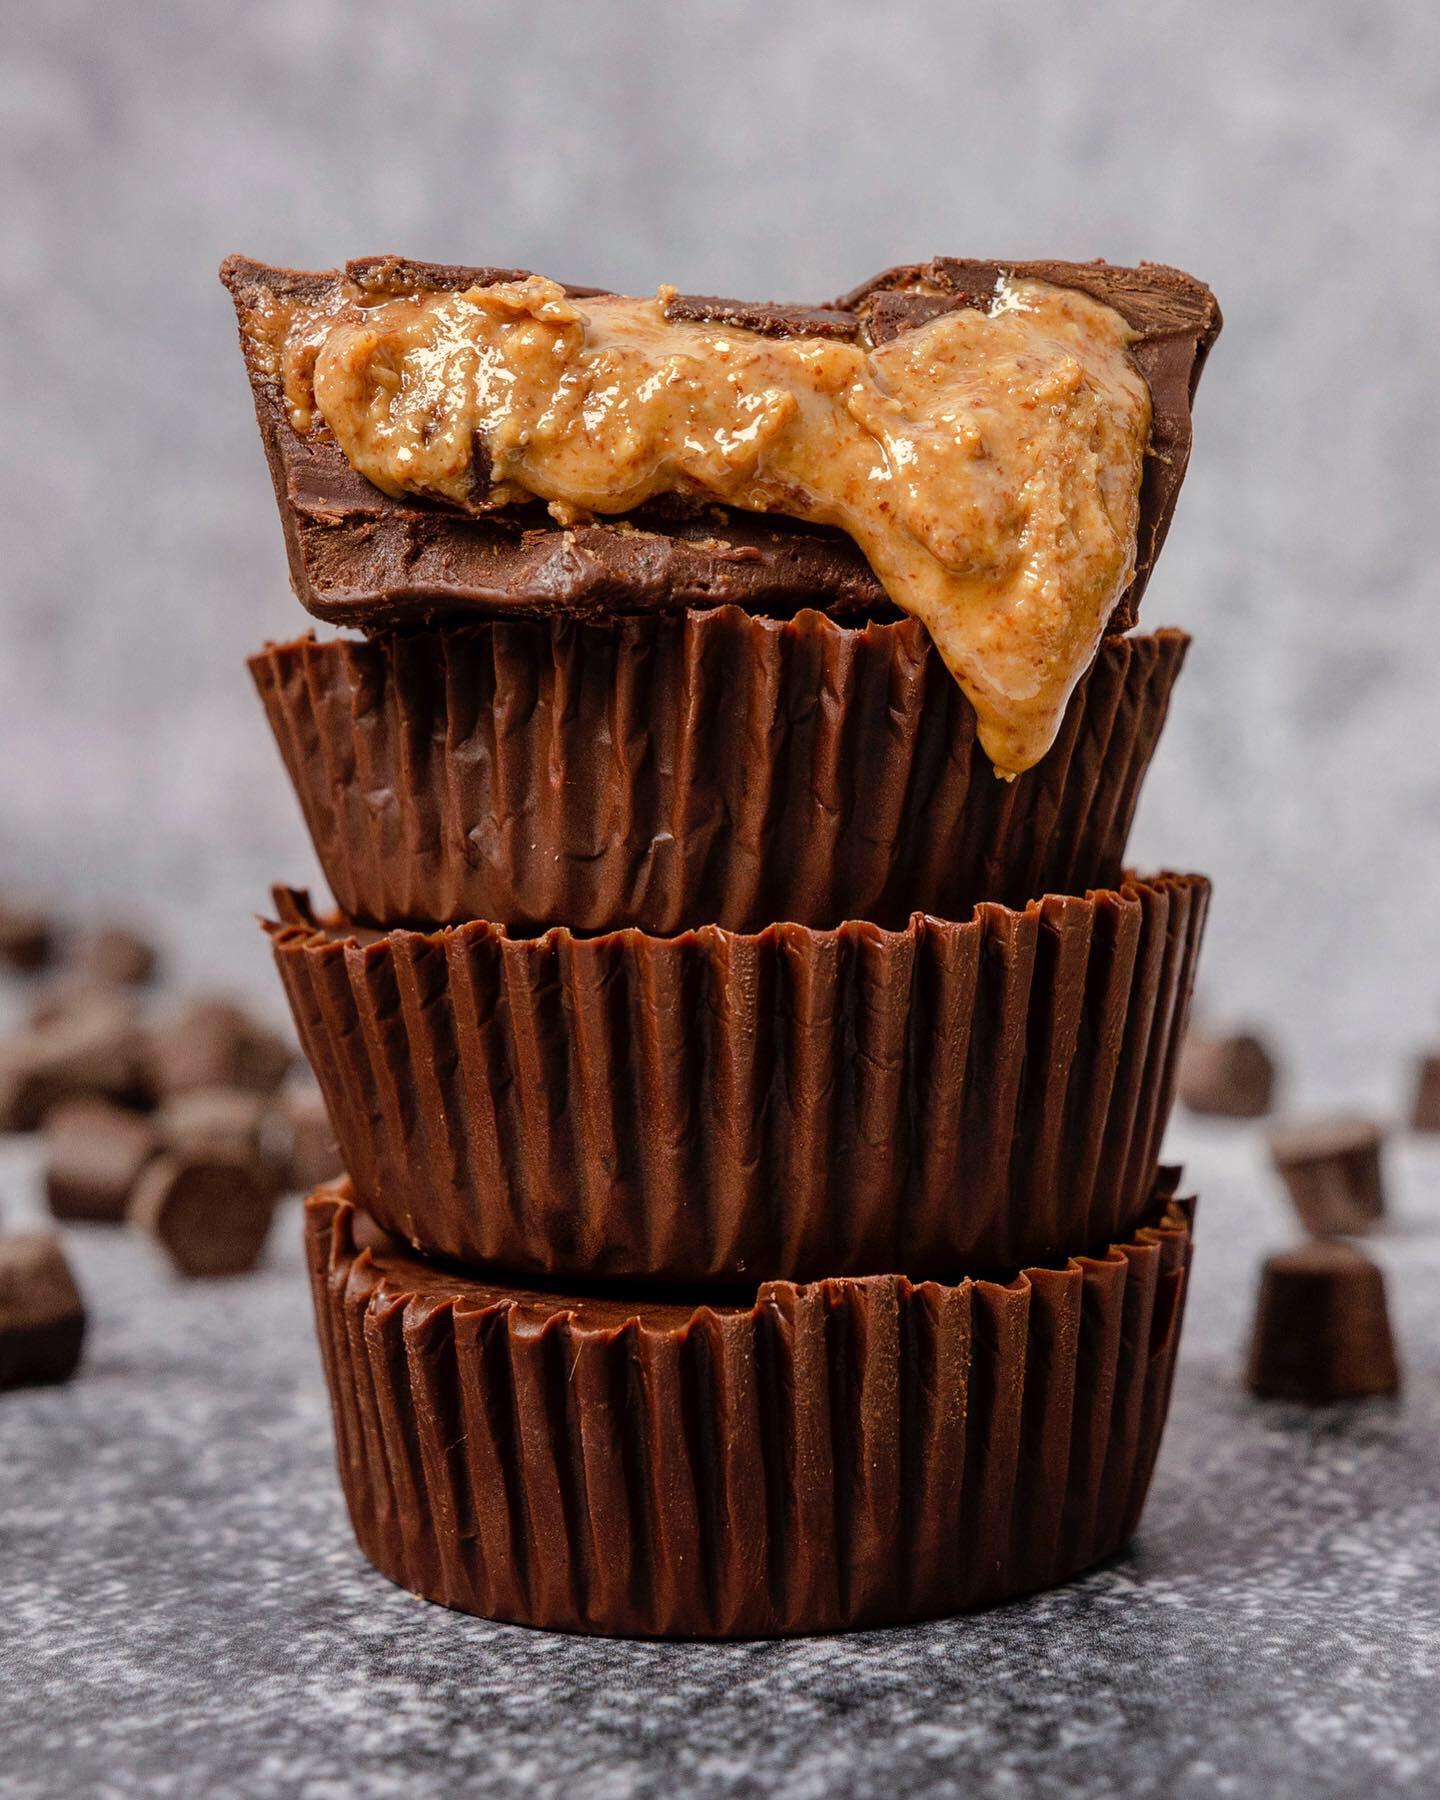 Almond Butter Filled Dark Chocolate Cups  | Paleo, Vegan, Gluten-free Recipe